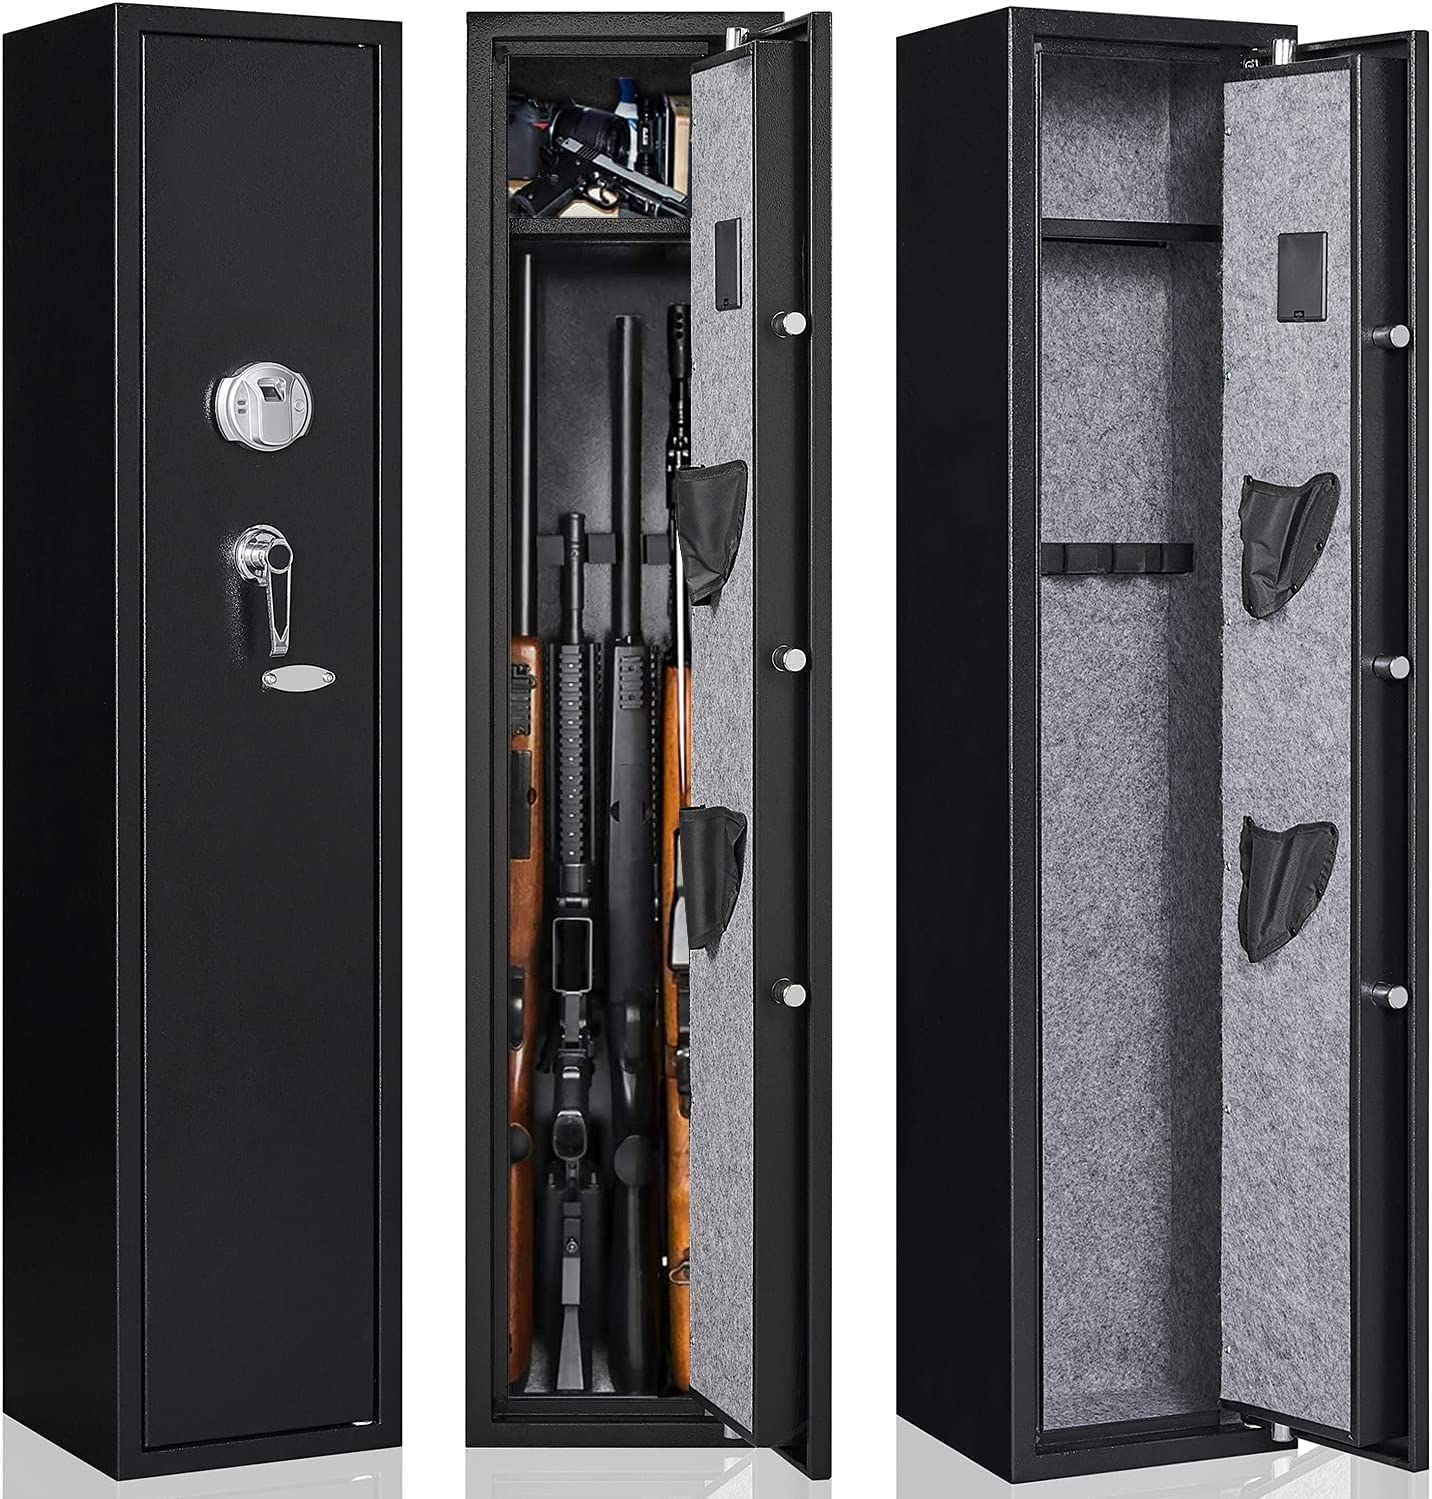 Gun Safe for Rifle and Pistols, Large Rifle Safe 5 Rifles Storage, Multiple Quick Access Biometric Fingerprint & Key, Shortgun Holder for Pistols, Removable Storage Shelf Ammo Lock Box